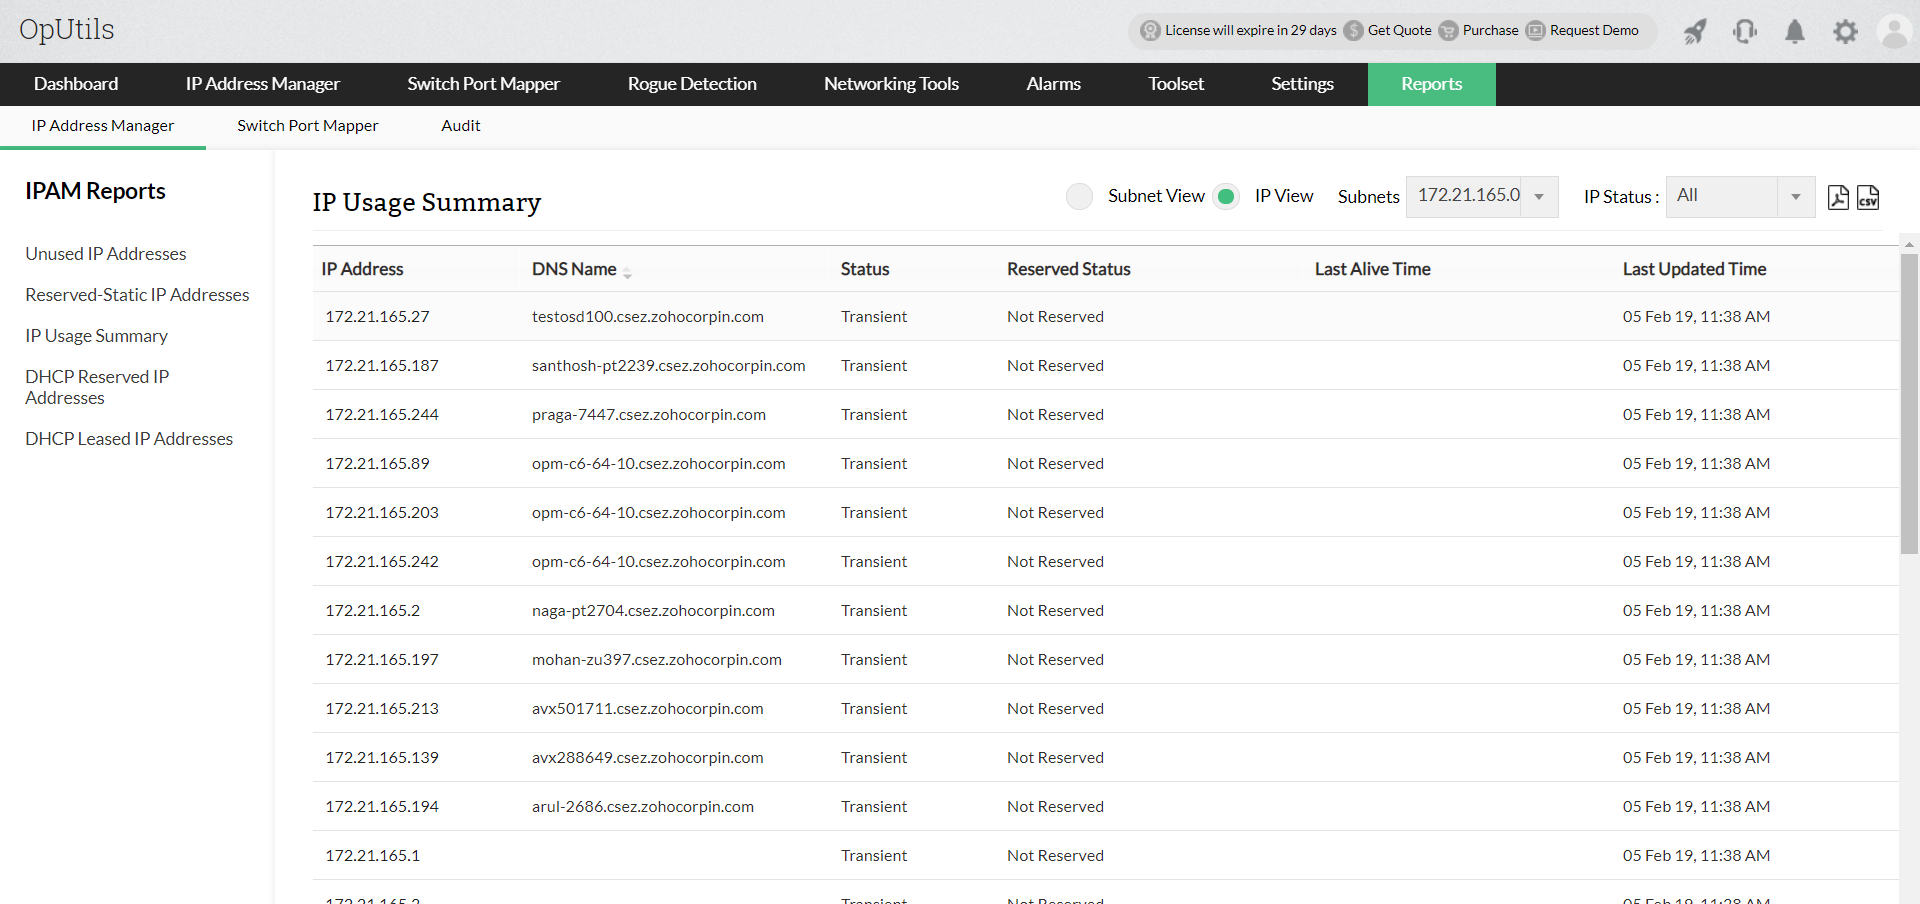 Rapporter om IP-adresshantering - ManageEngine Oputils